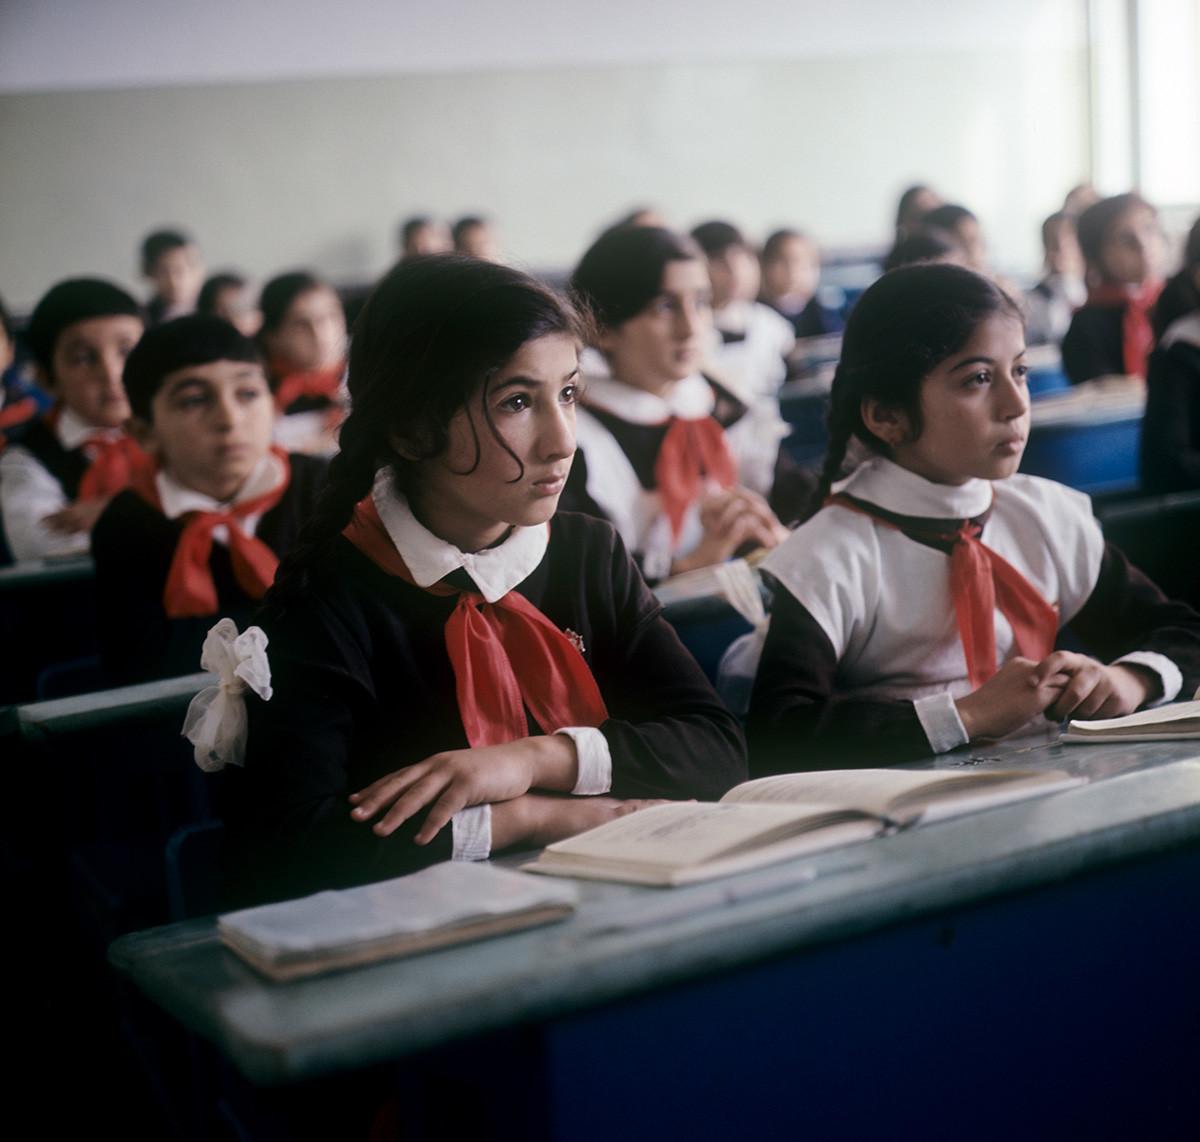 Pri pouku aritmetike v 5. razredu šole št. 15. Sumgait, Azerbajdžan